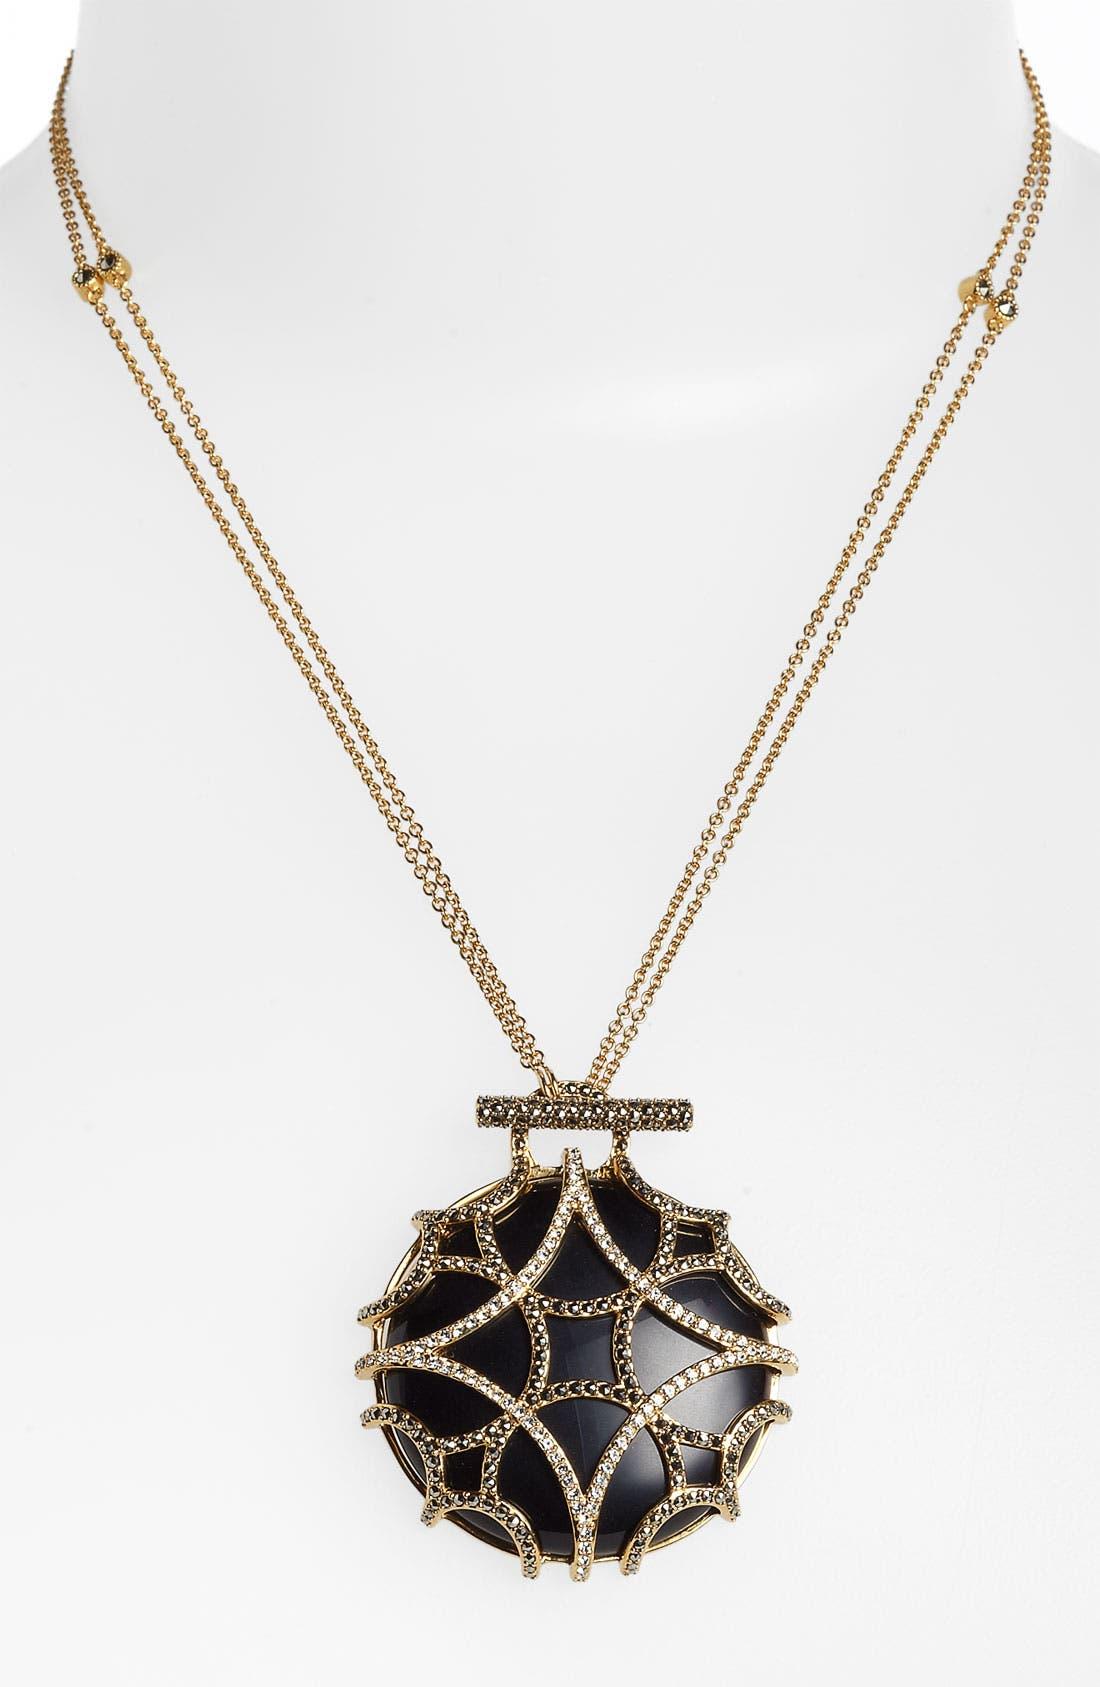 Main Image - Judith Jack 'Matrix' Long Convertible Pendant Necklace